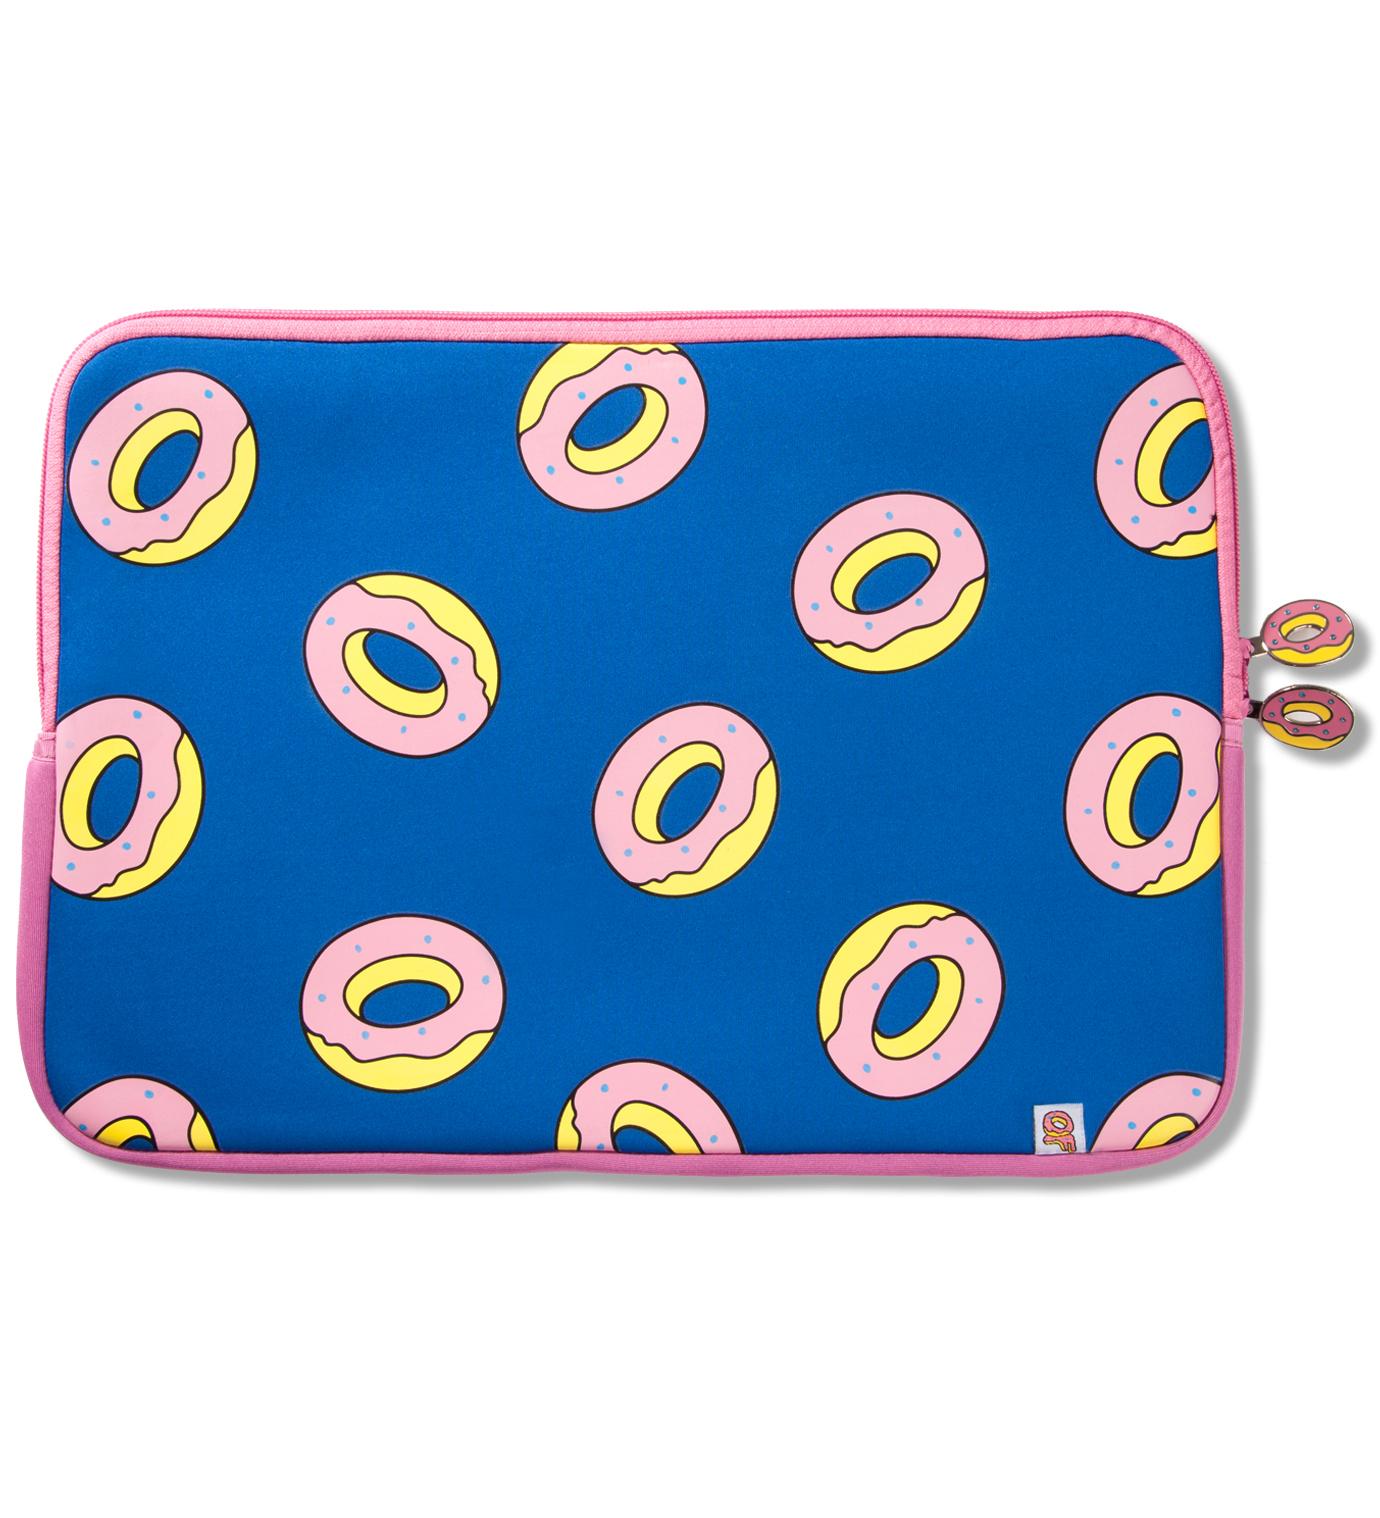 "Odd Future Blue 15"" Donut Laptop Sleeve"